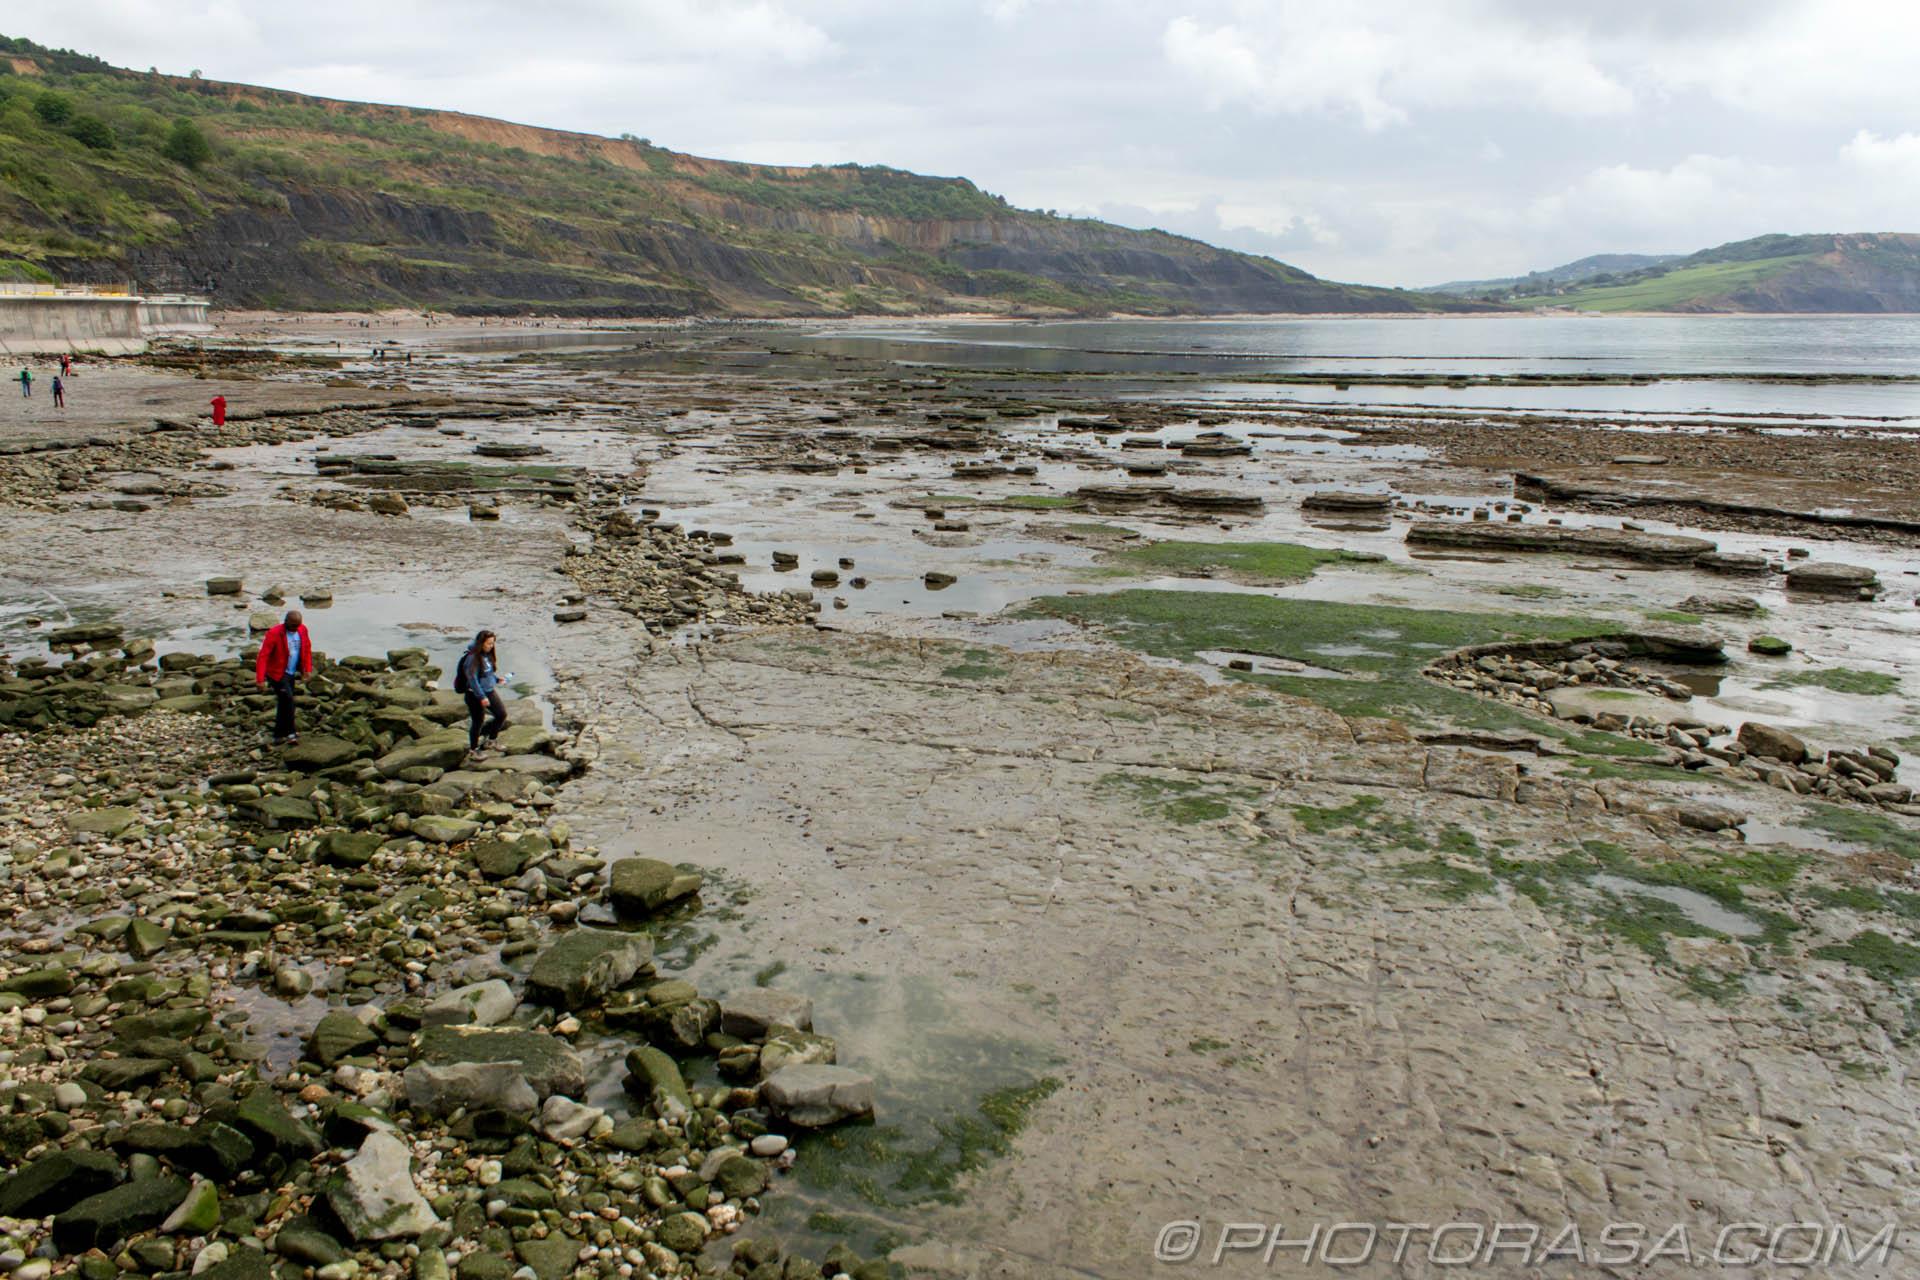 https://photorasa.com/jurassic-coast-lyme-regis/people-walking-on-rocks-at-lyme-regis/